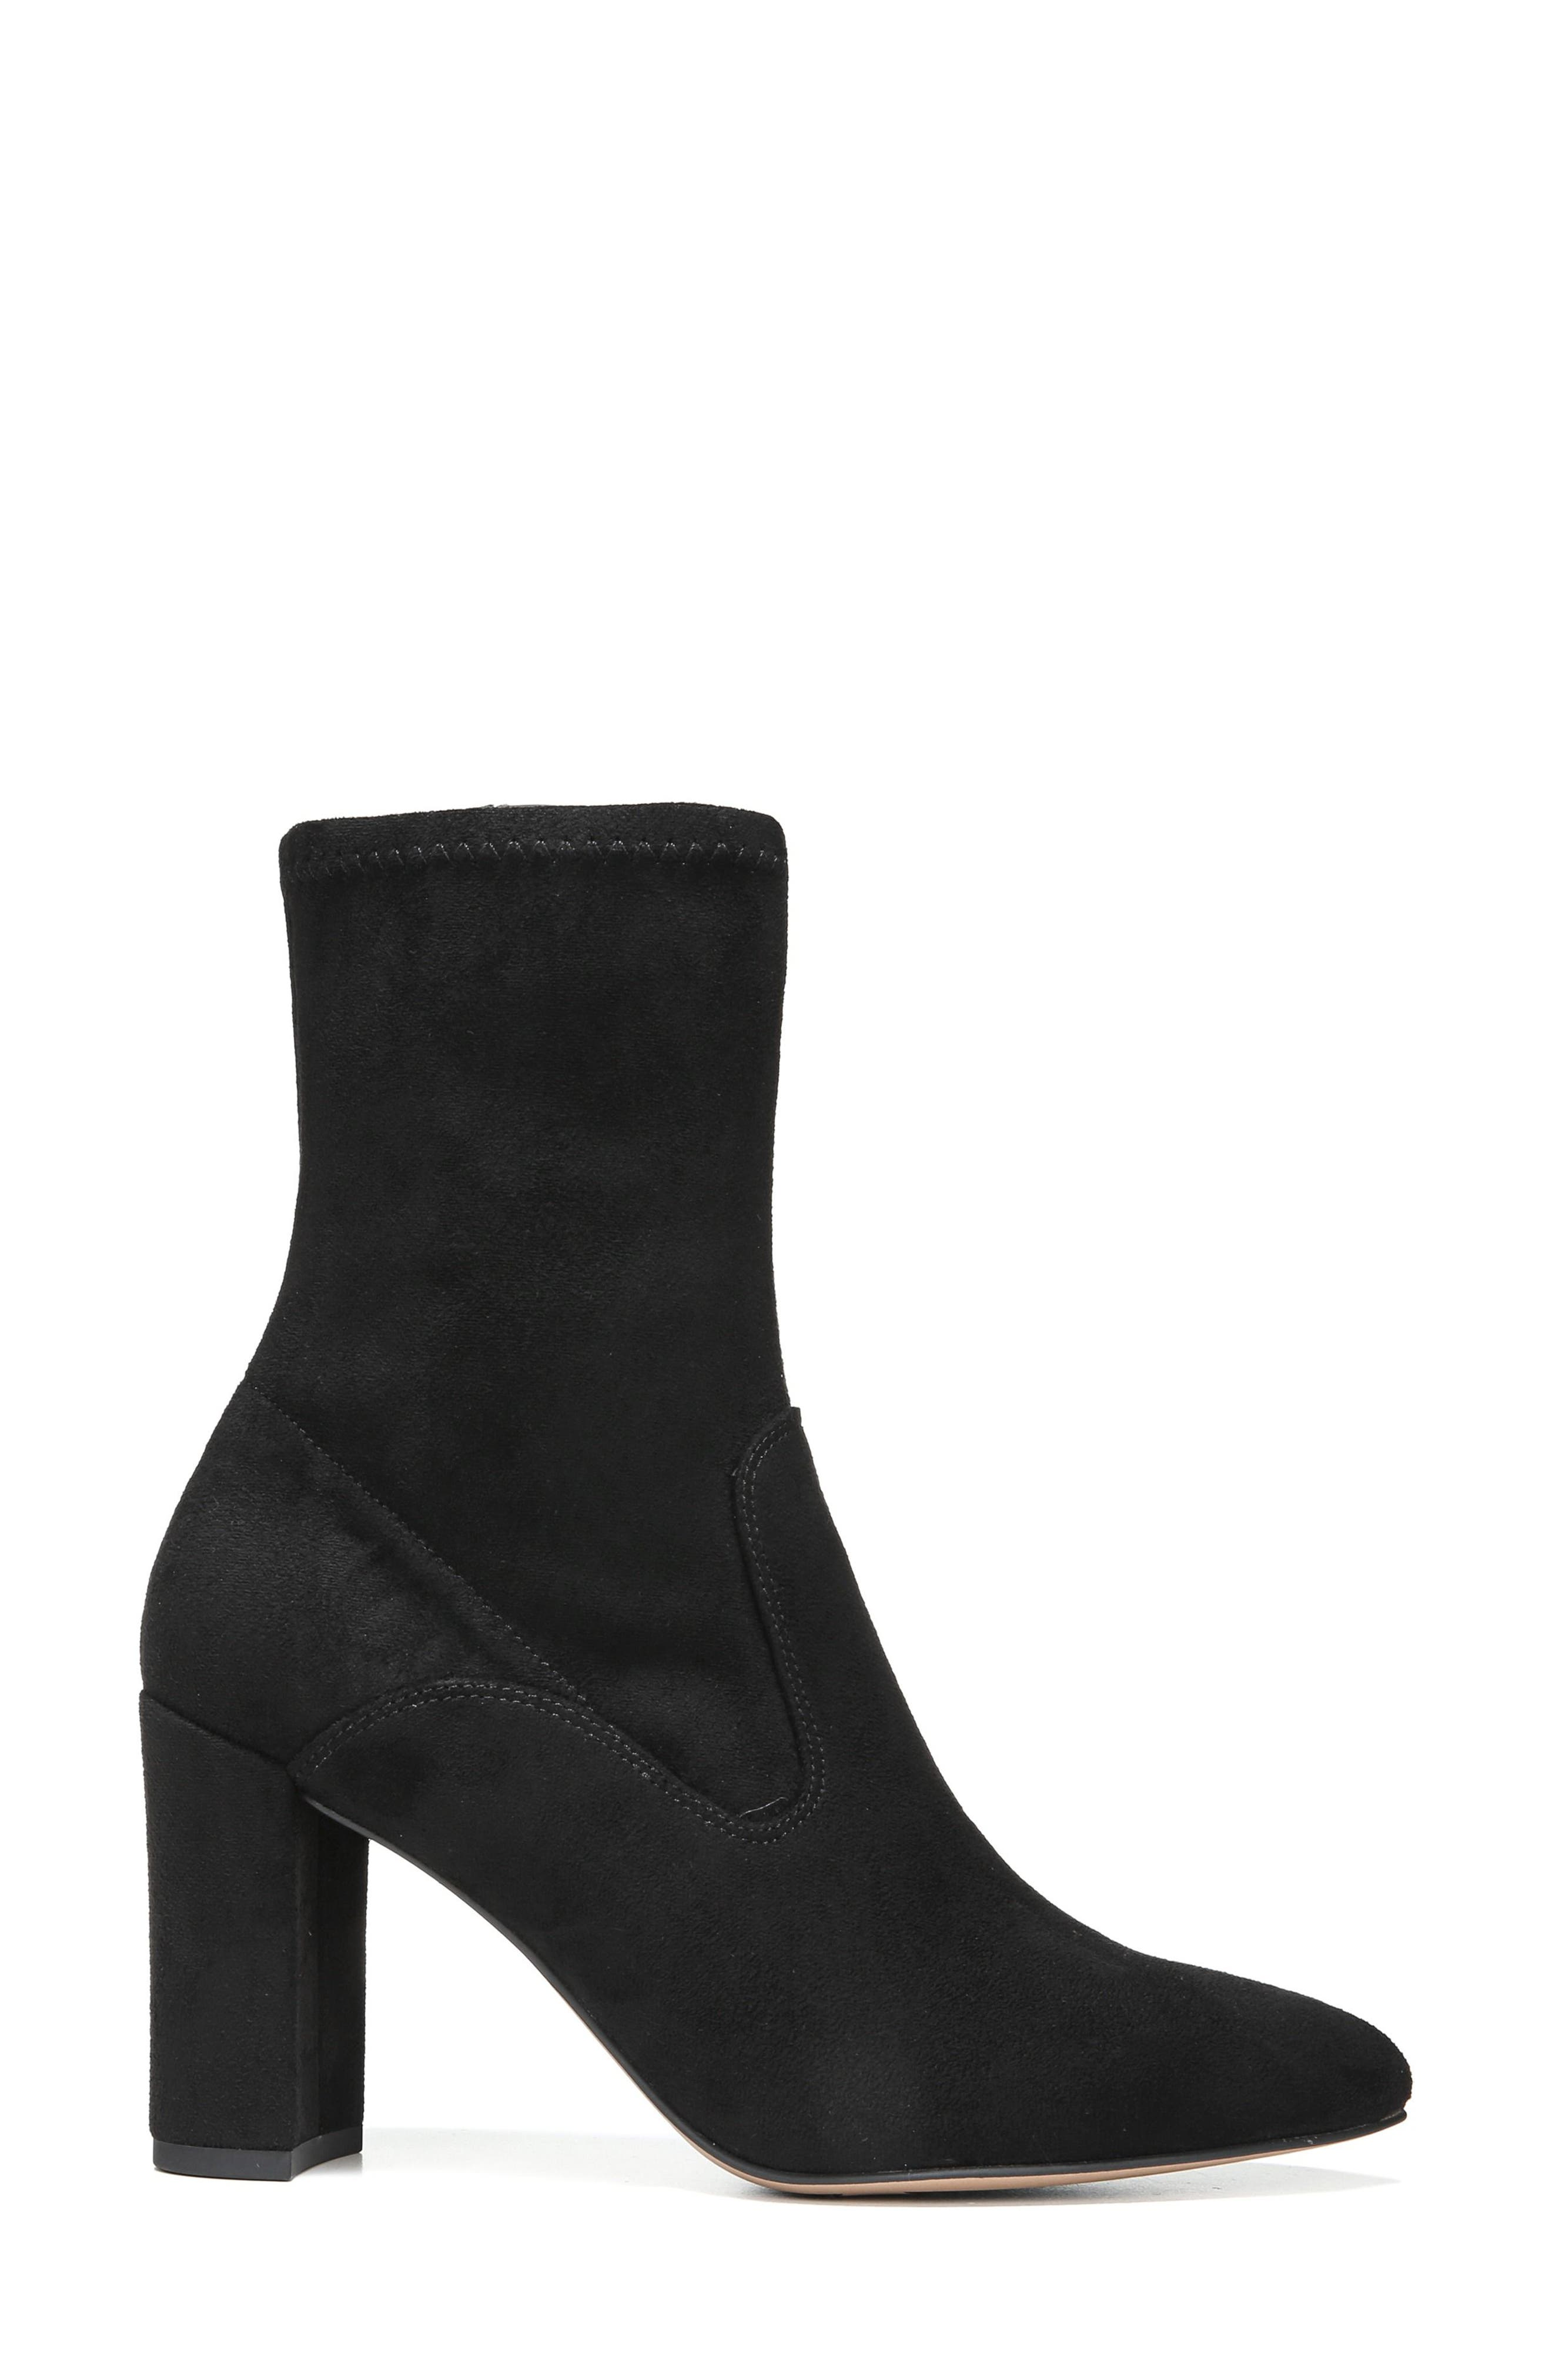 Fancy Boot,                             Alternate thumbnail 3, color,                             Black Suede